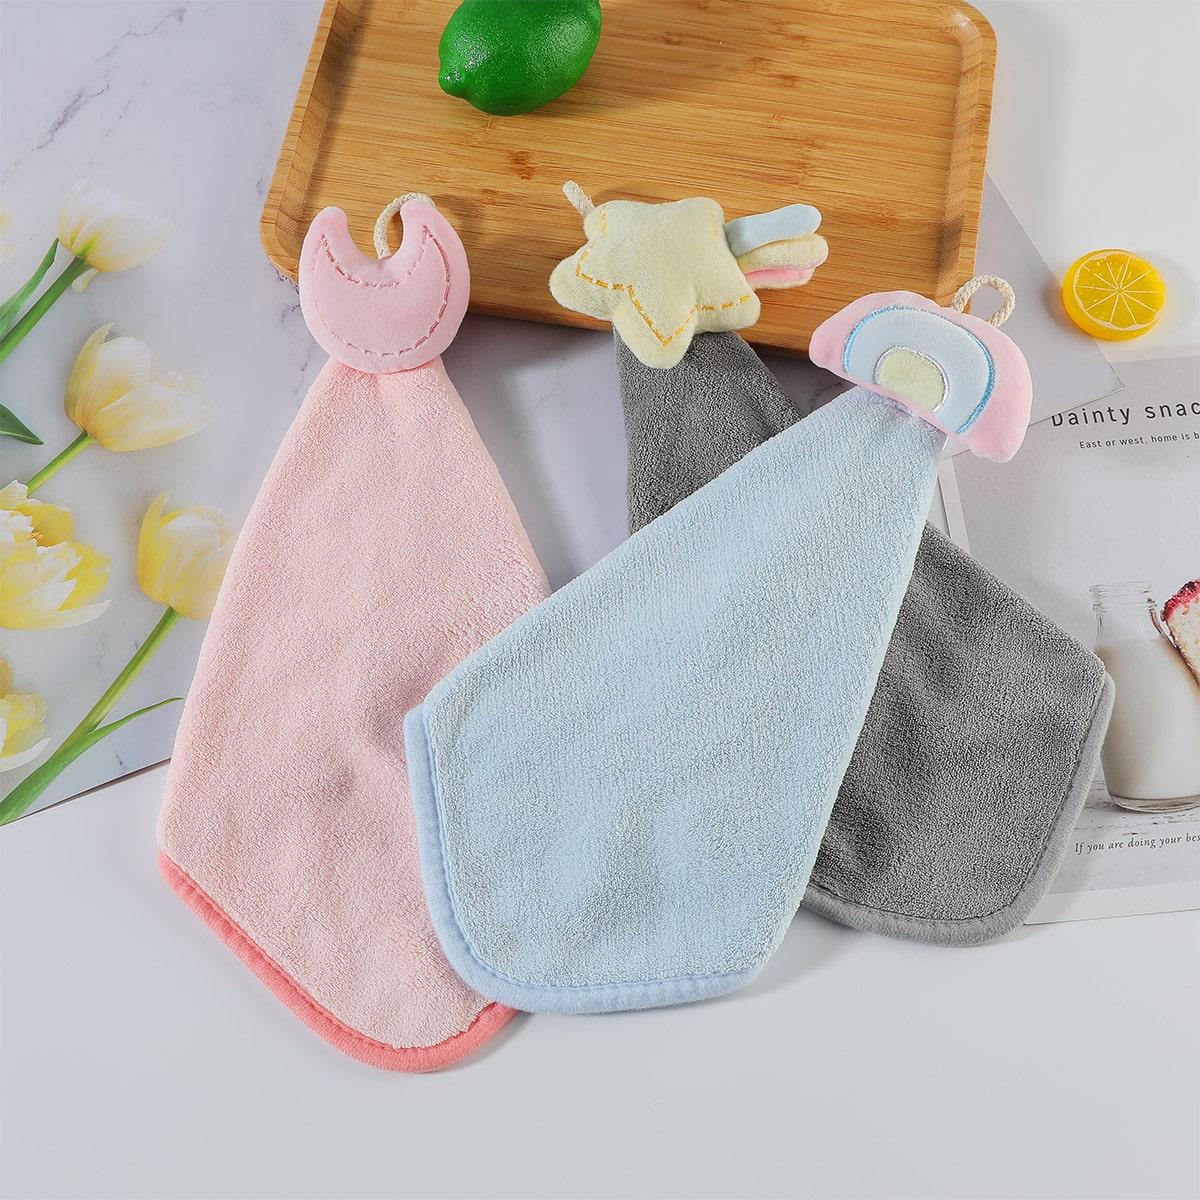 1Pc Random Color Hand Towel